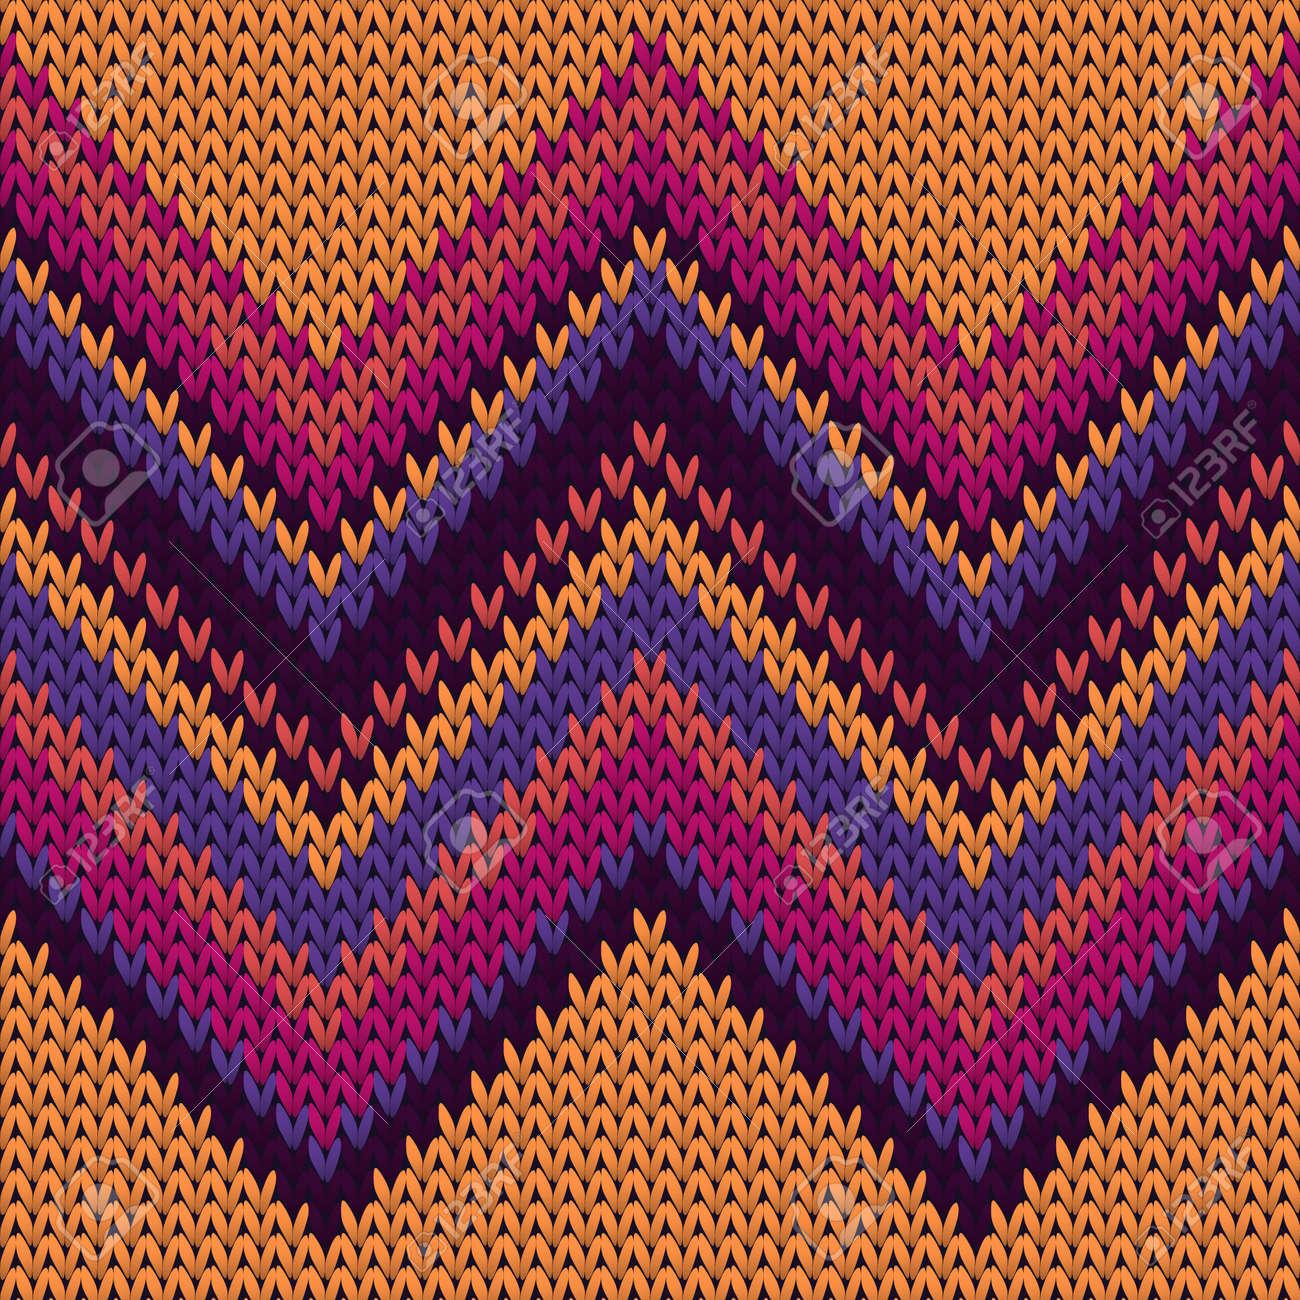 Handmade zig zal lines christmas knit geometric seamless pattern. Plaid knit tricot fabric print. Norwegian style seamless knitted pattern. Winter holidays wallpaper. - 158131718